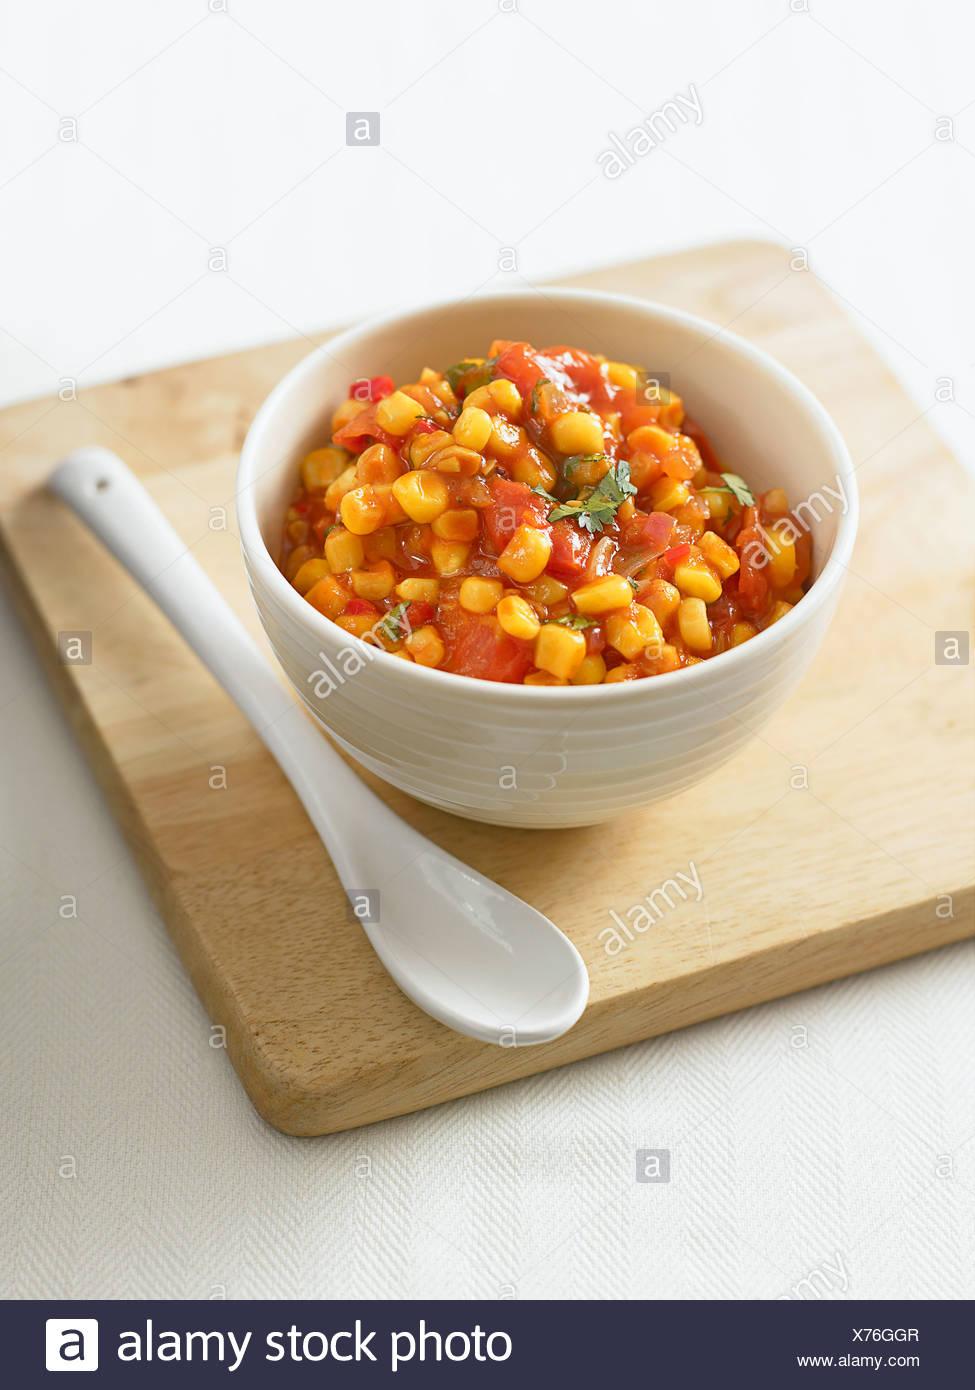 Bowl of corn relish on chopping board, close-up - Stock Image